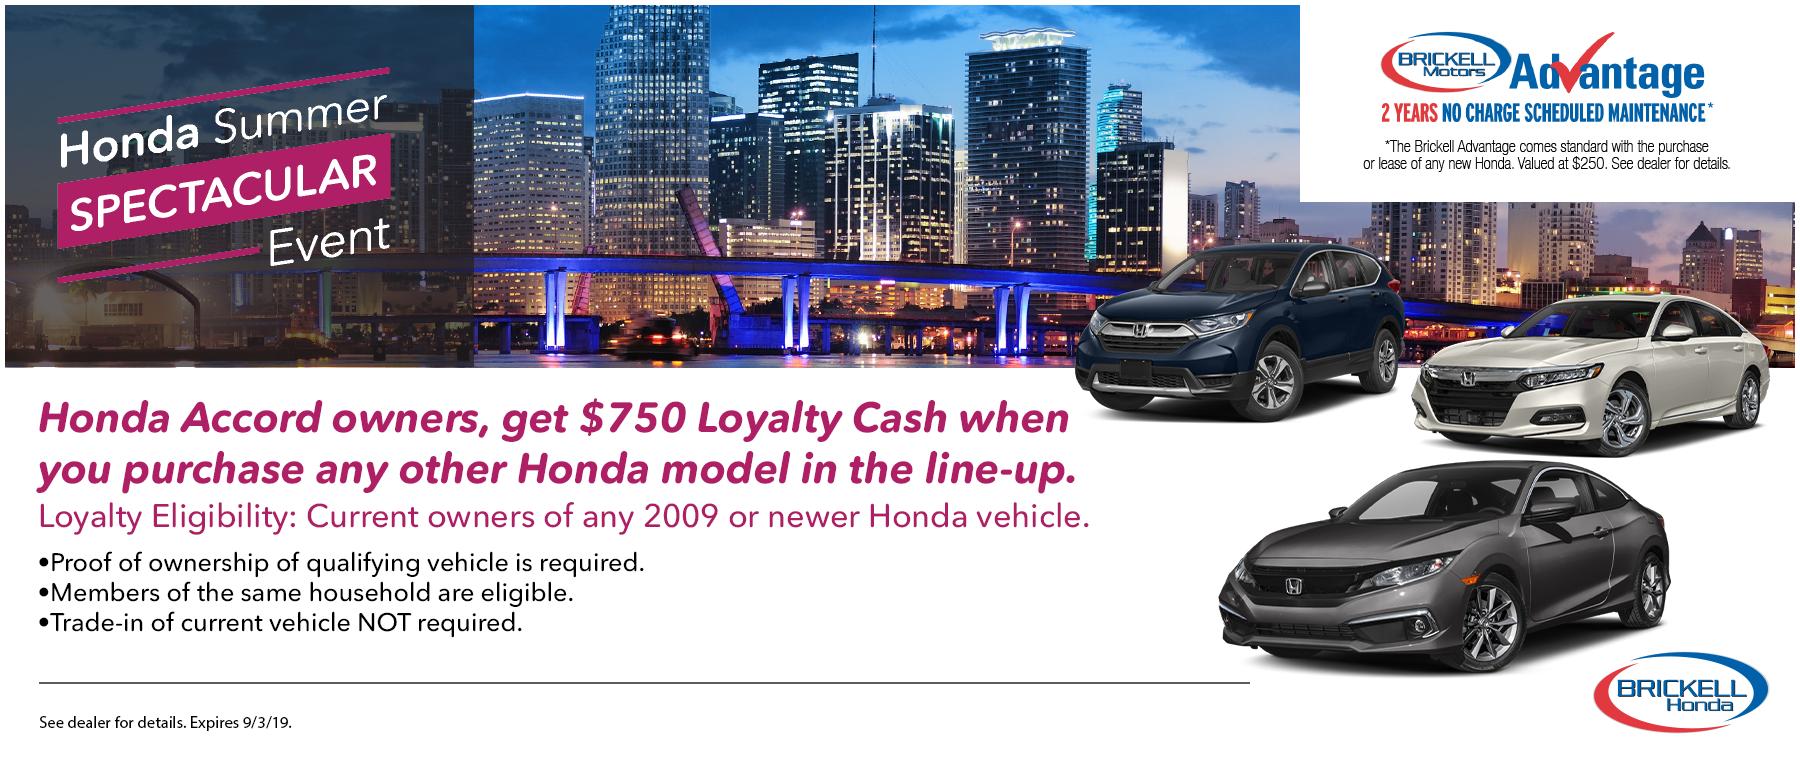 Summer Spectacular Event - Honda Accord